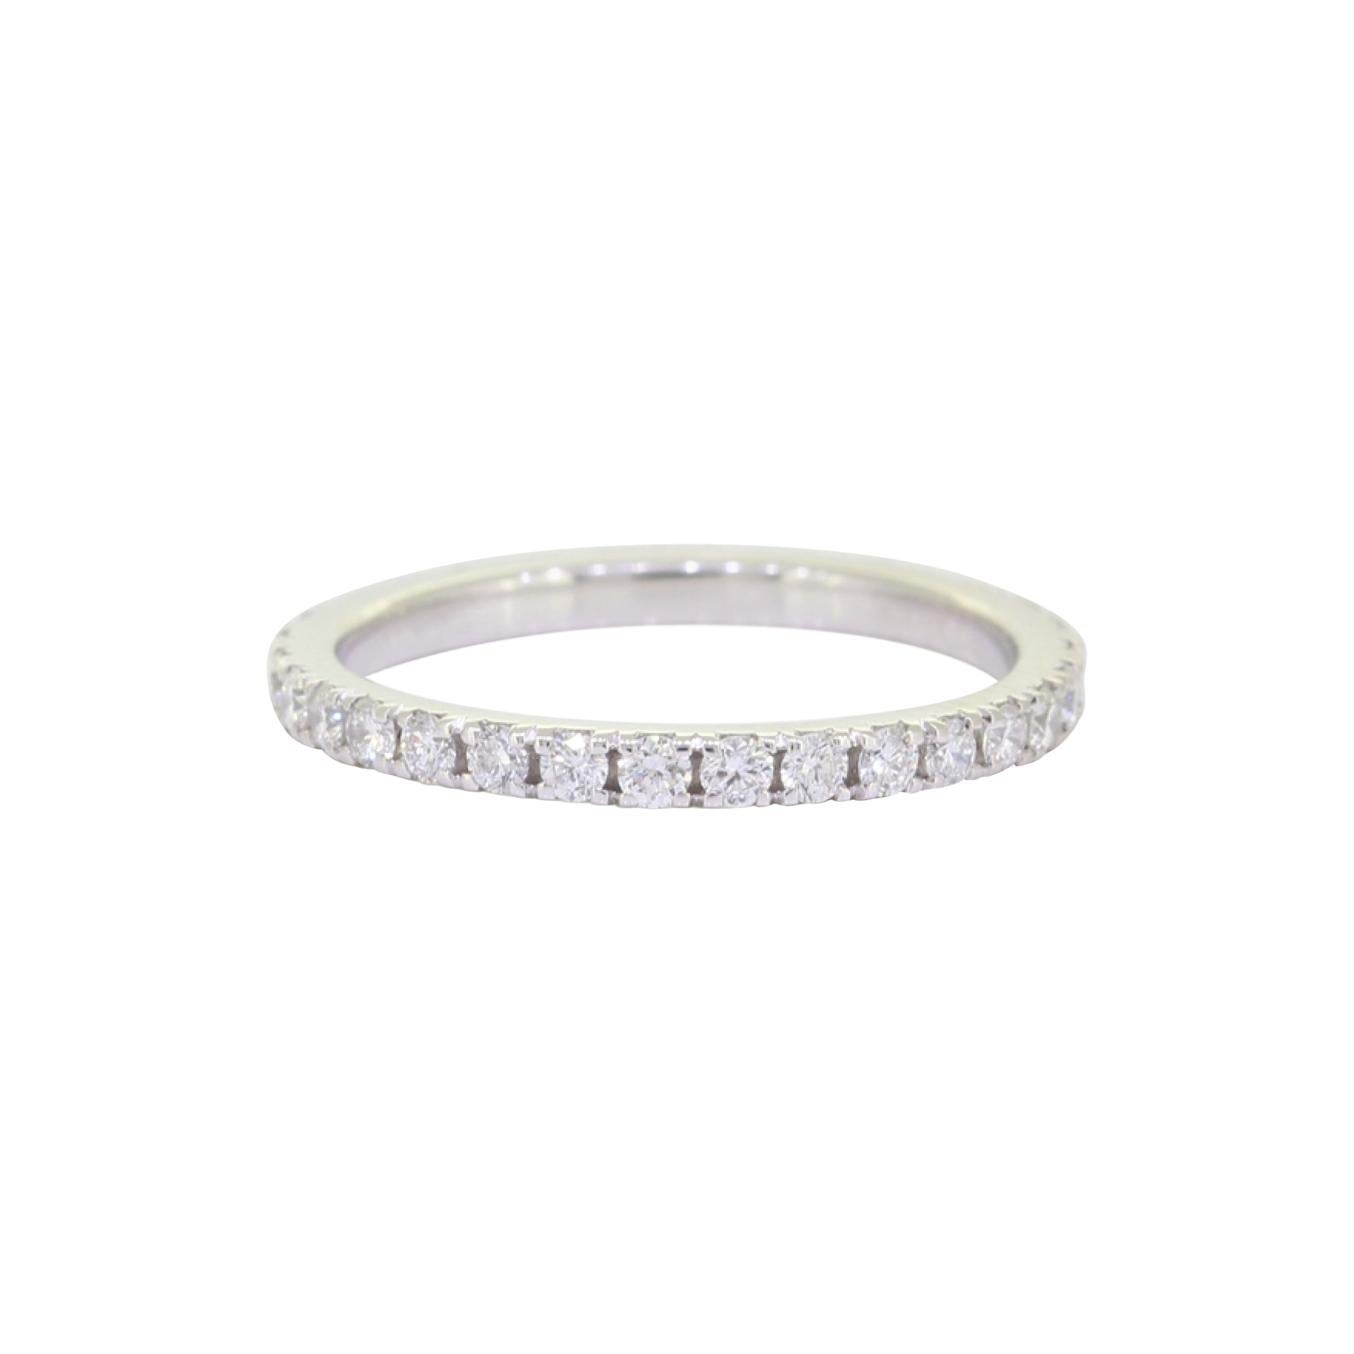 Eternity Platinum Wedding Band 3/4 Carat